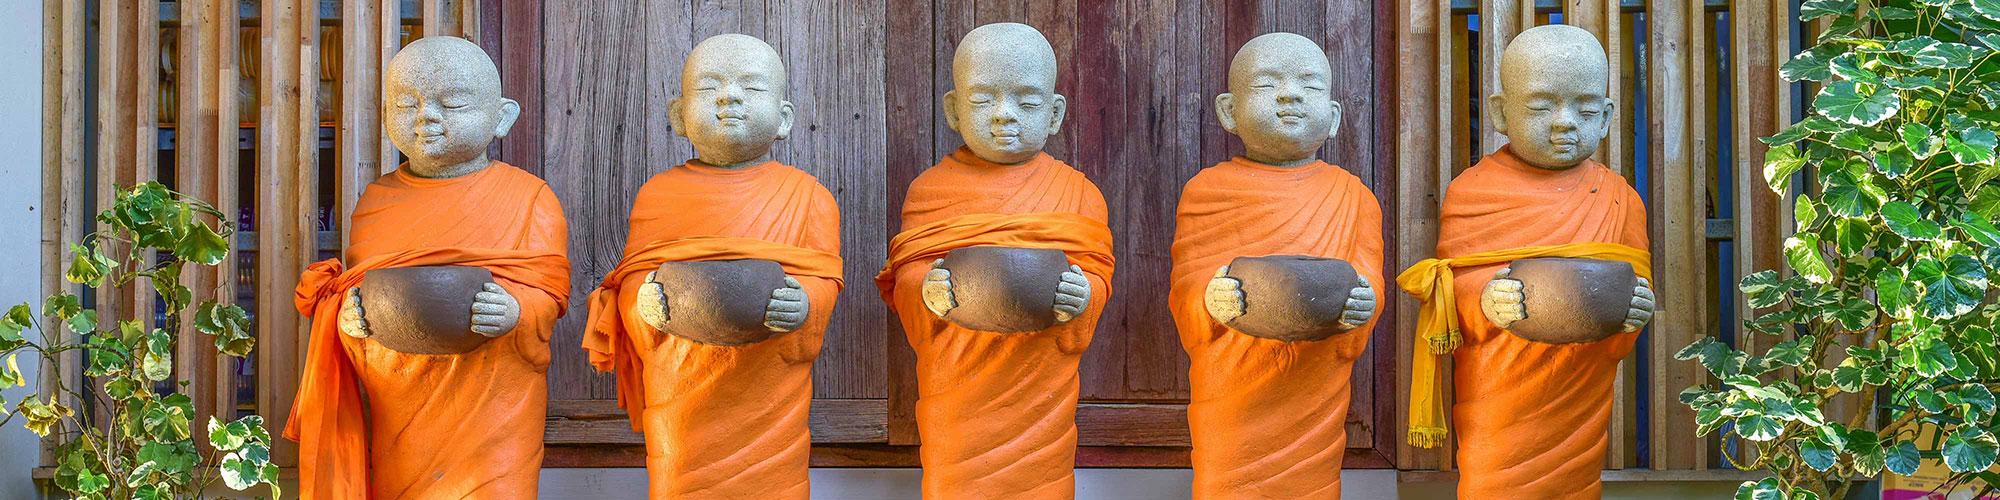 Khmer Monk Wooden Figures Holding Bowls